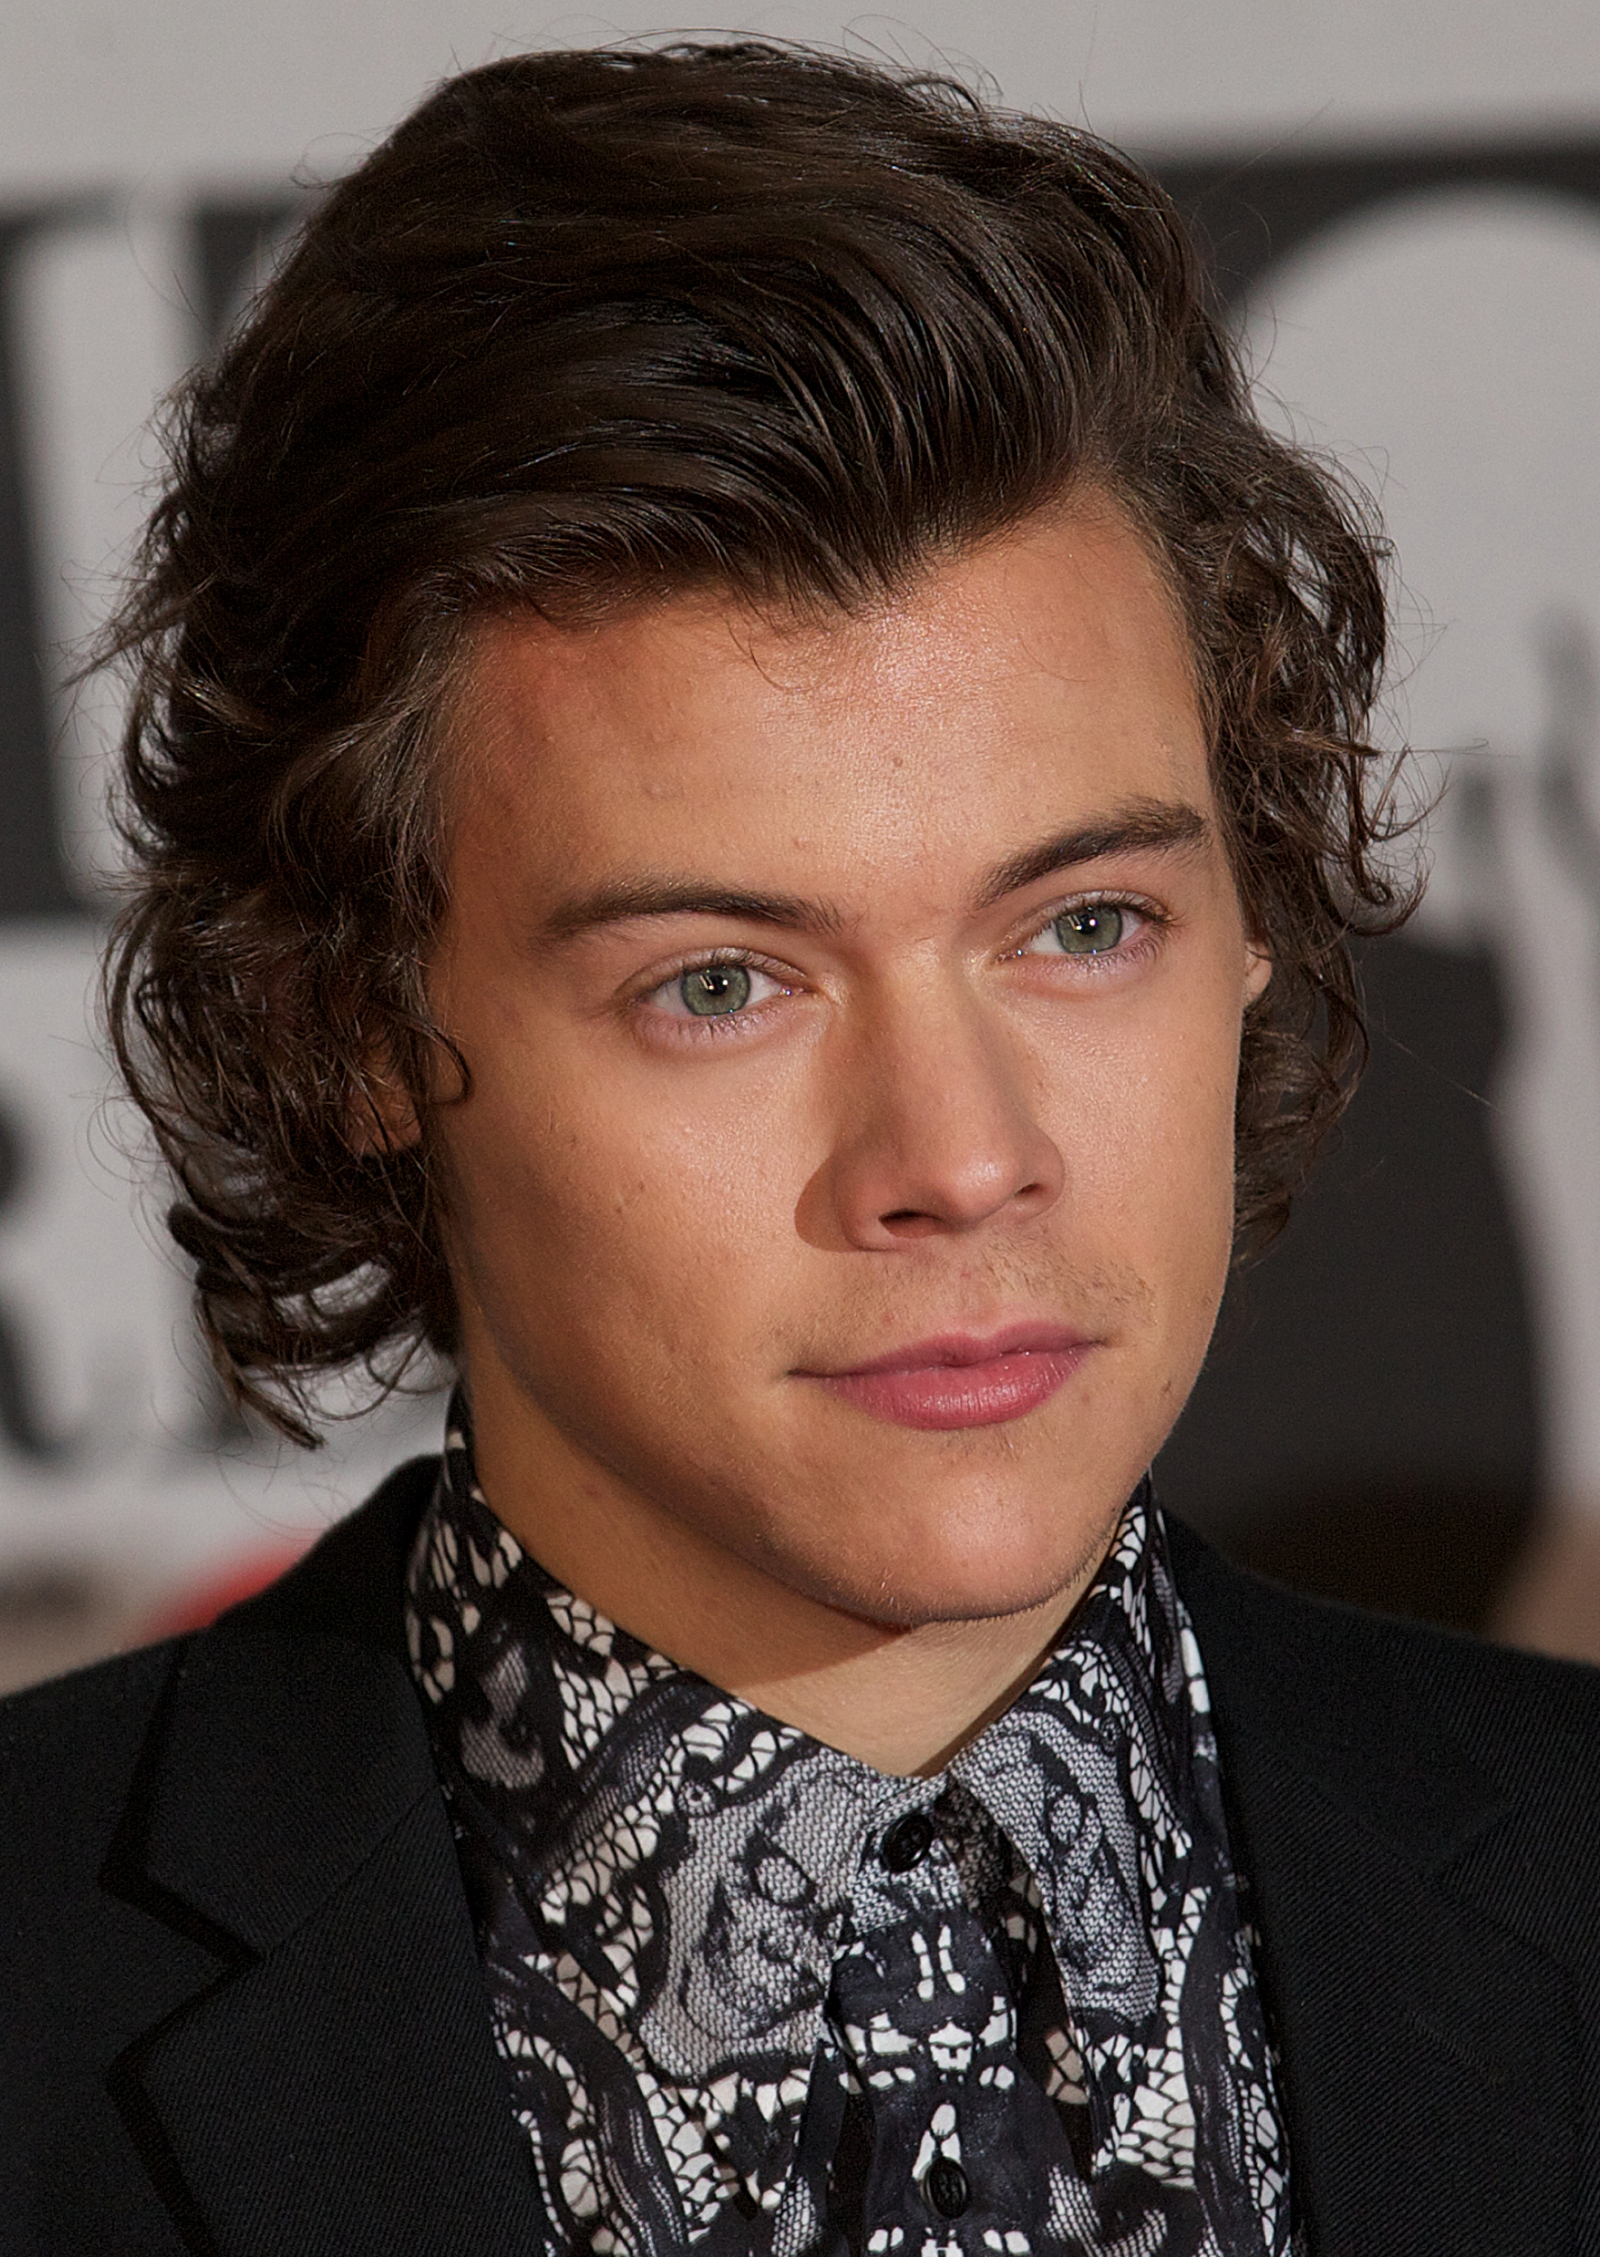 Brilliant One Direction Star Harry Styles39 Idol Mick Jagger Takes Him Under Short Hairstyles Gunalazisus